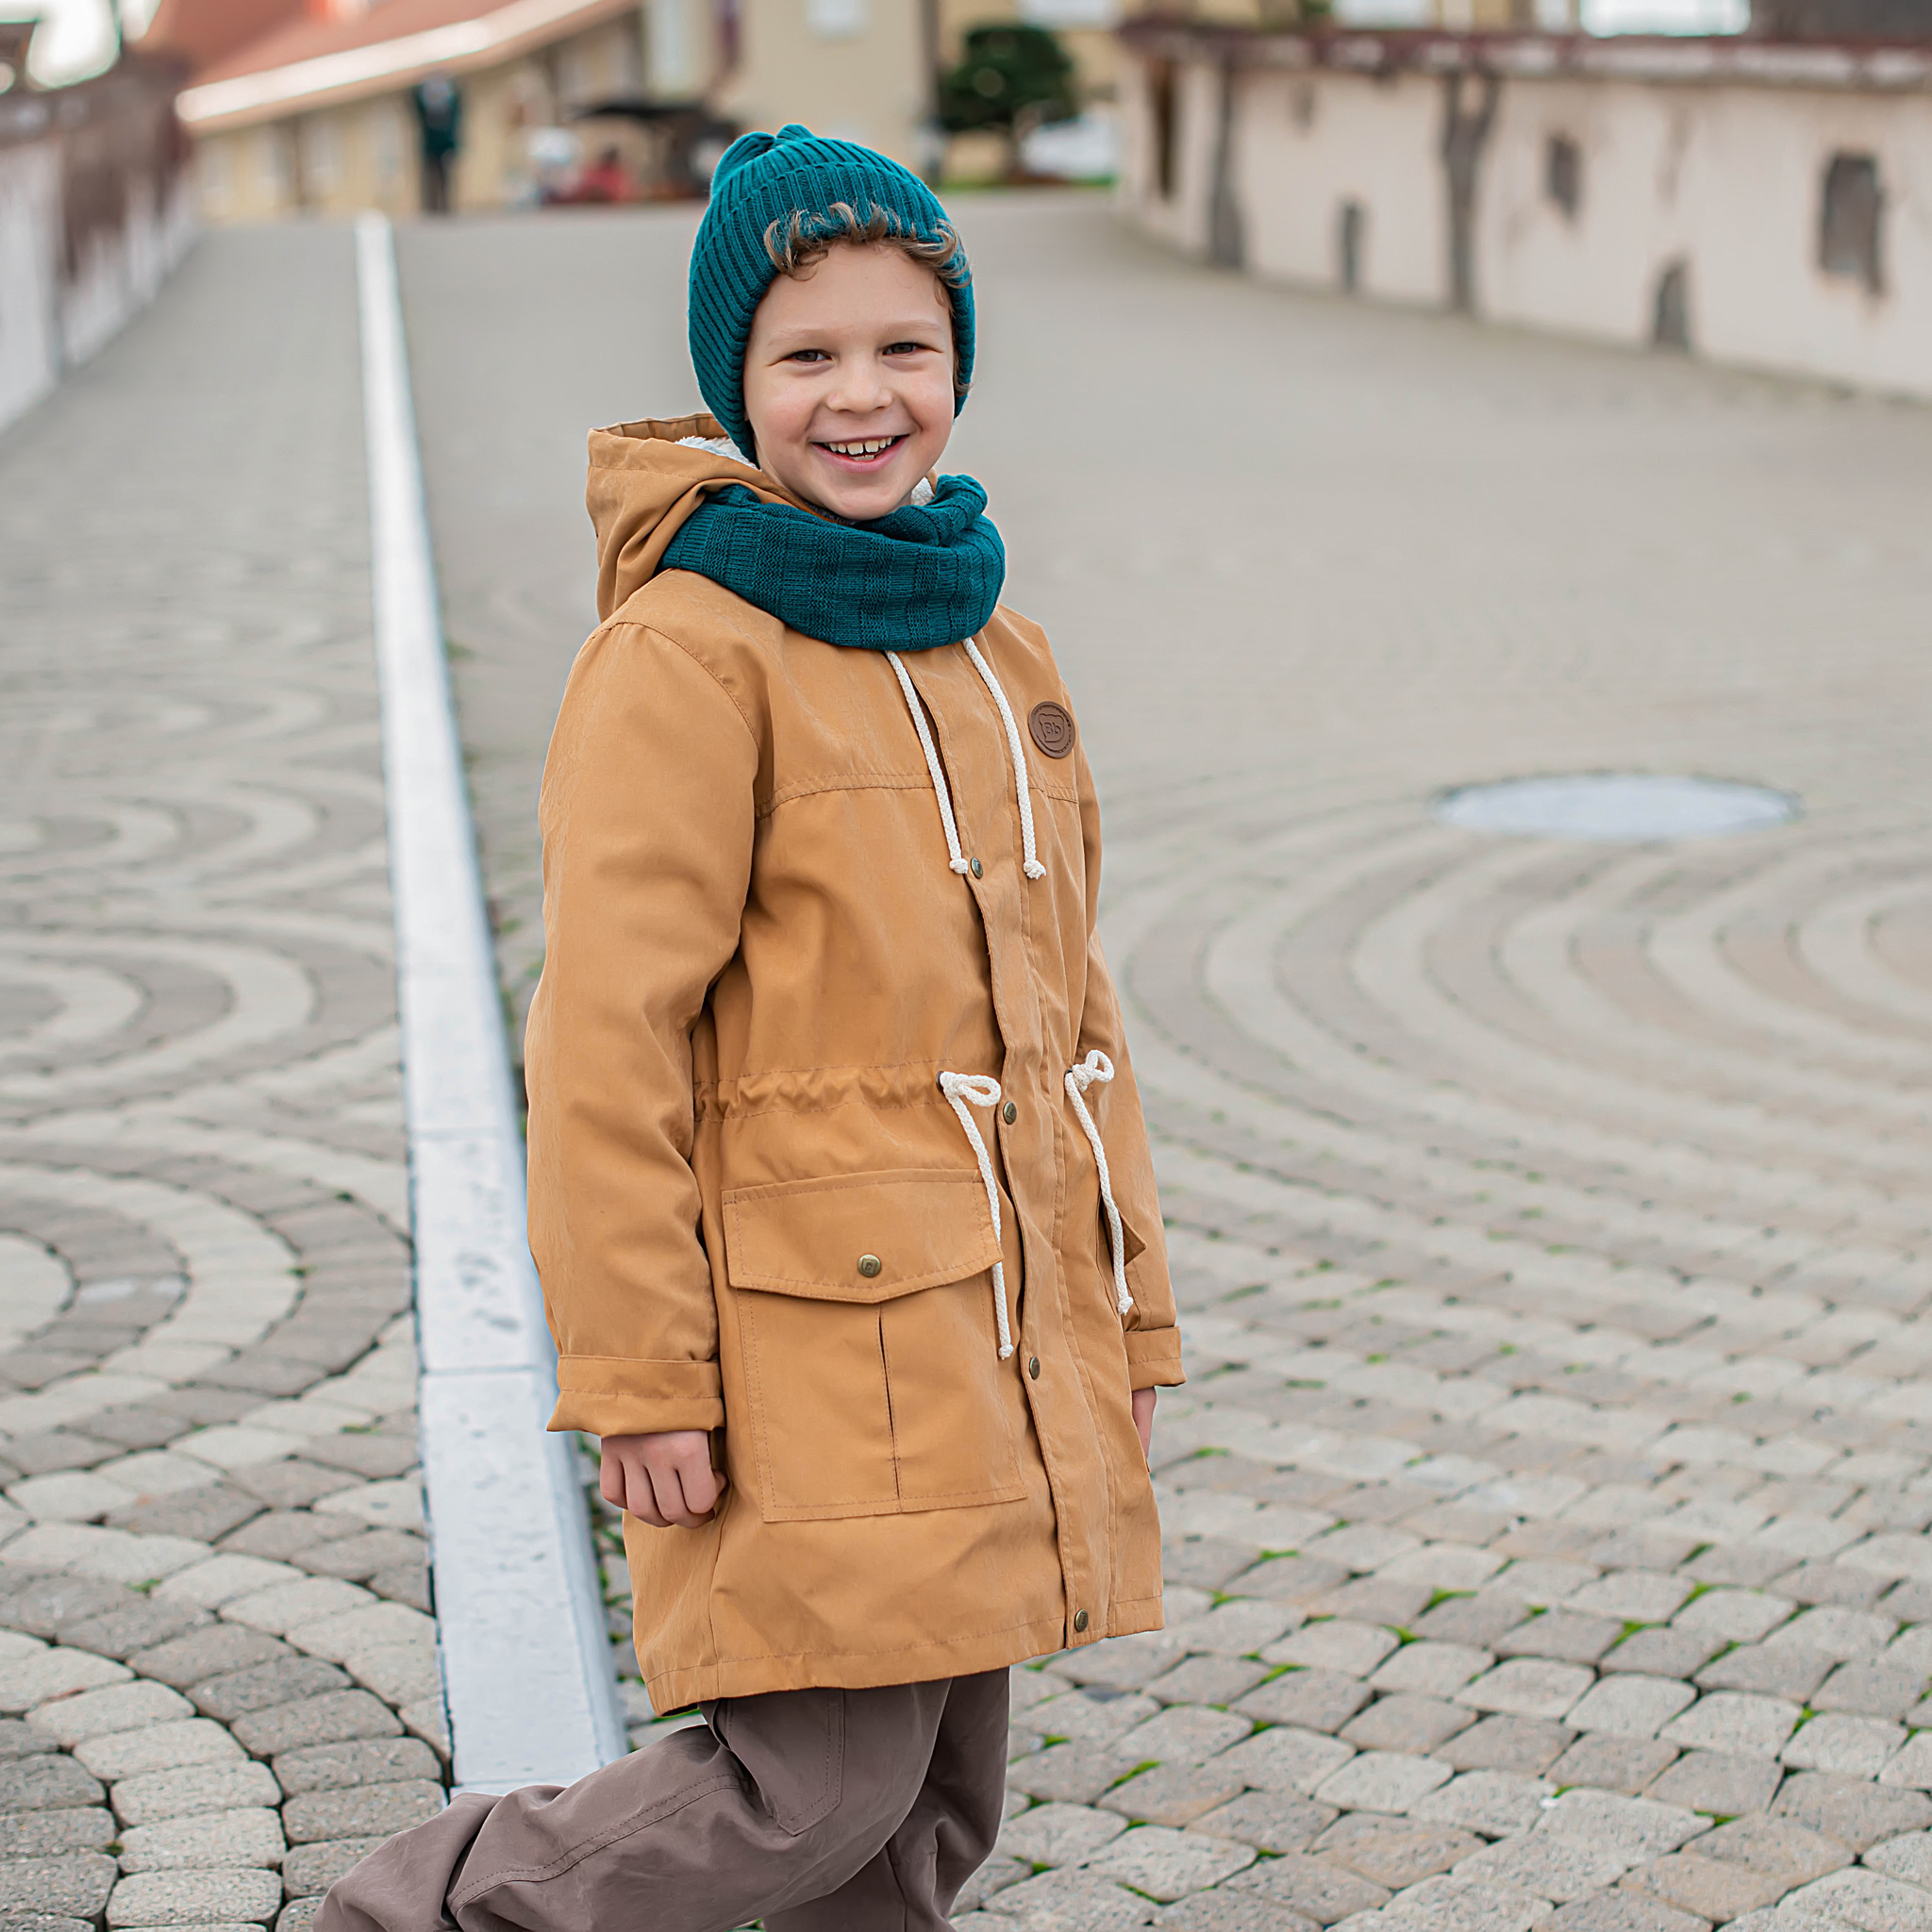 Demi-season parka with fur for teens - Camel